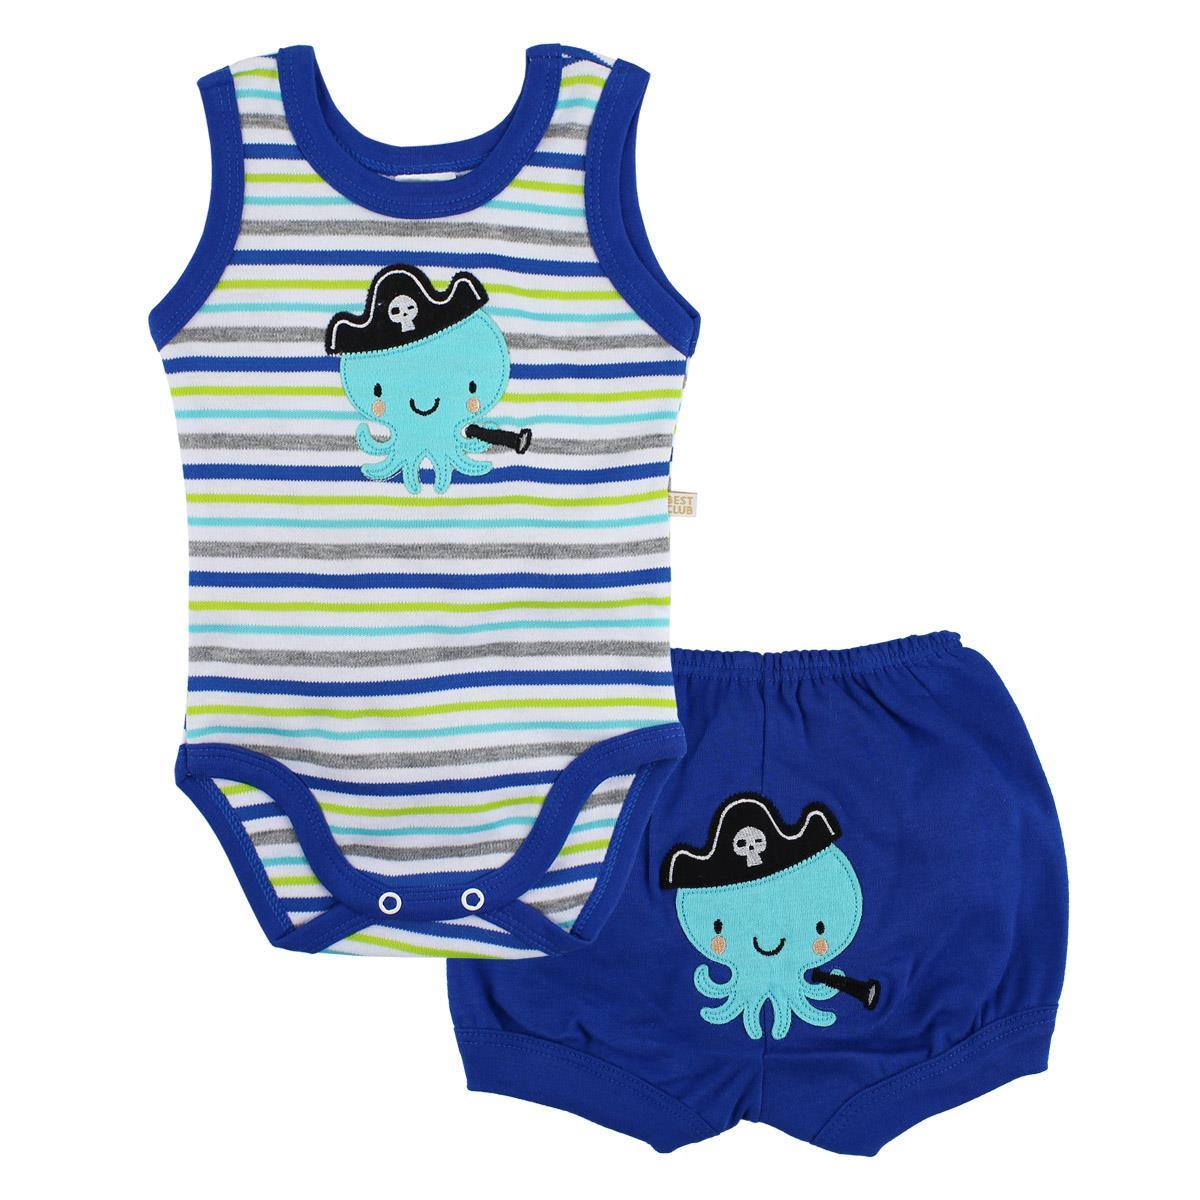 Kit Body Regata Best Club e Short Polvo Azul / Tamanho P